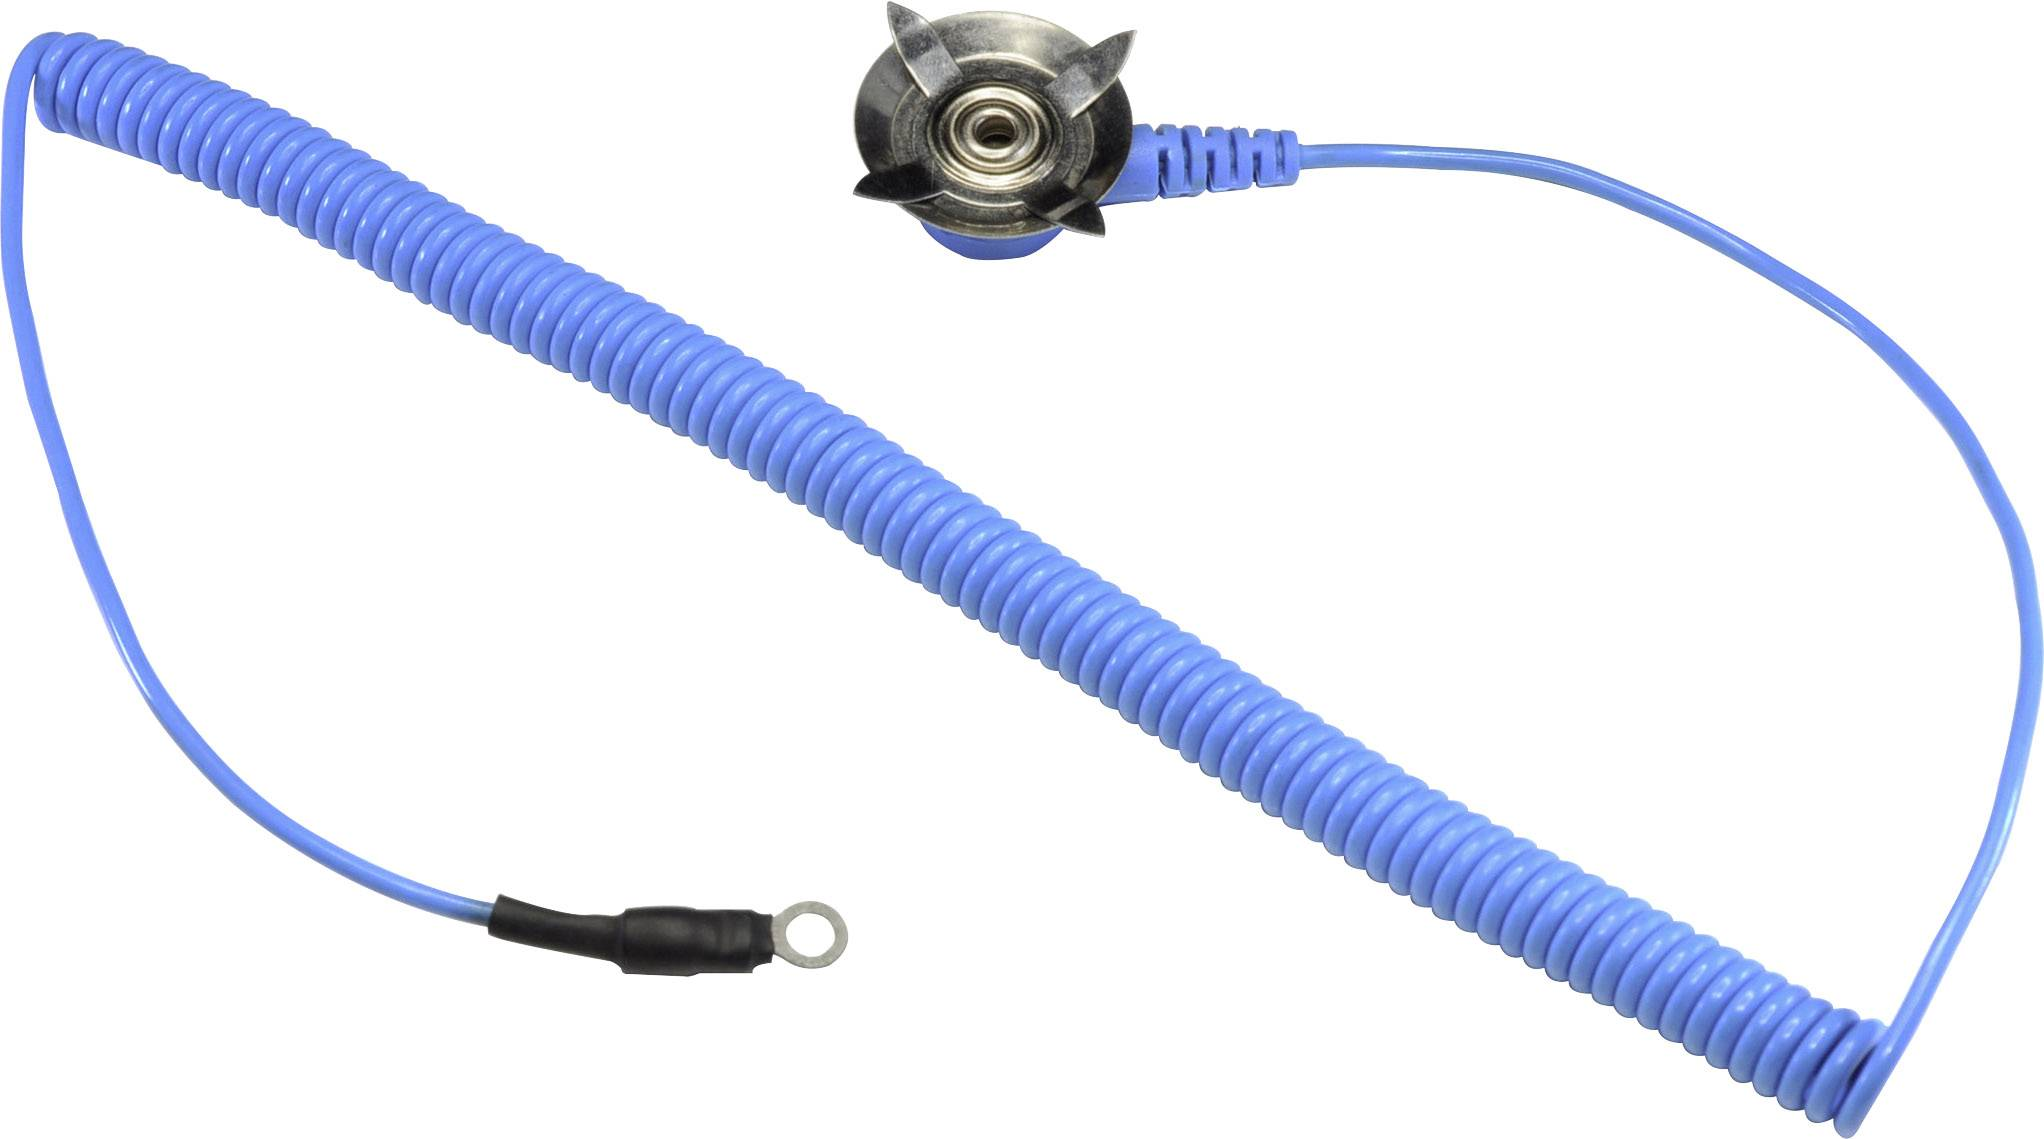 ESD uzemňovací kábel k rohožke Conrad Components EkA-305-AD-R, 3.05 m